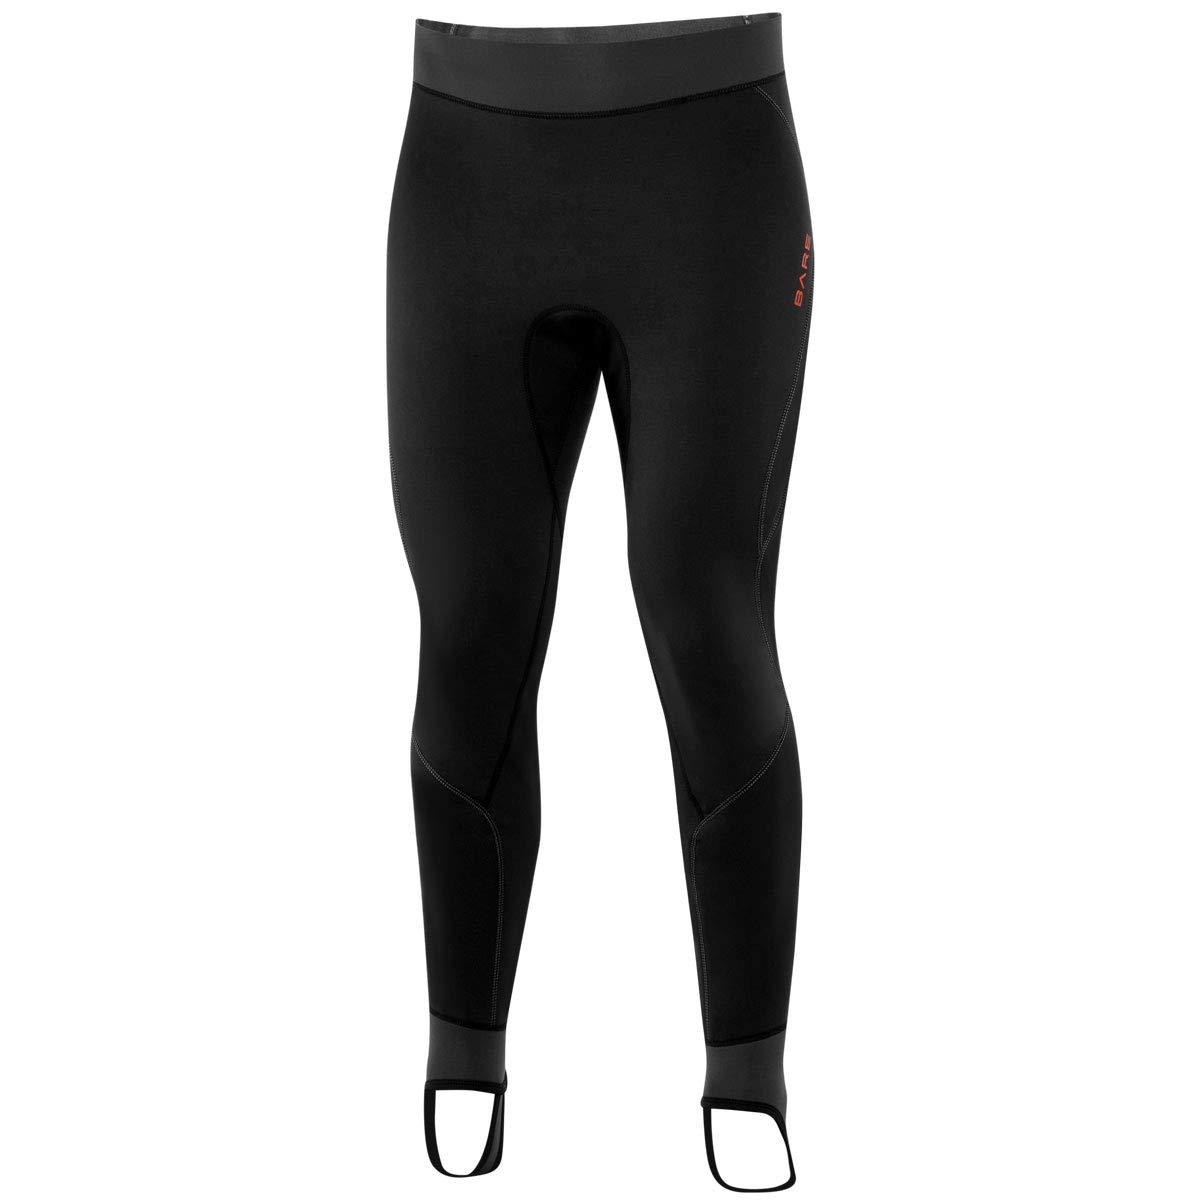 Bare Mens Exowear Pants Wet/Dry Undergarment (3X Large)